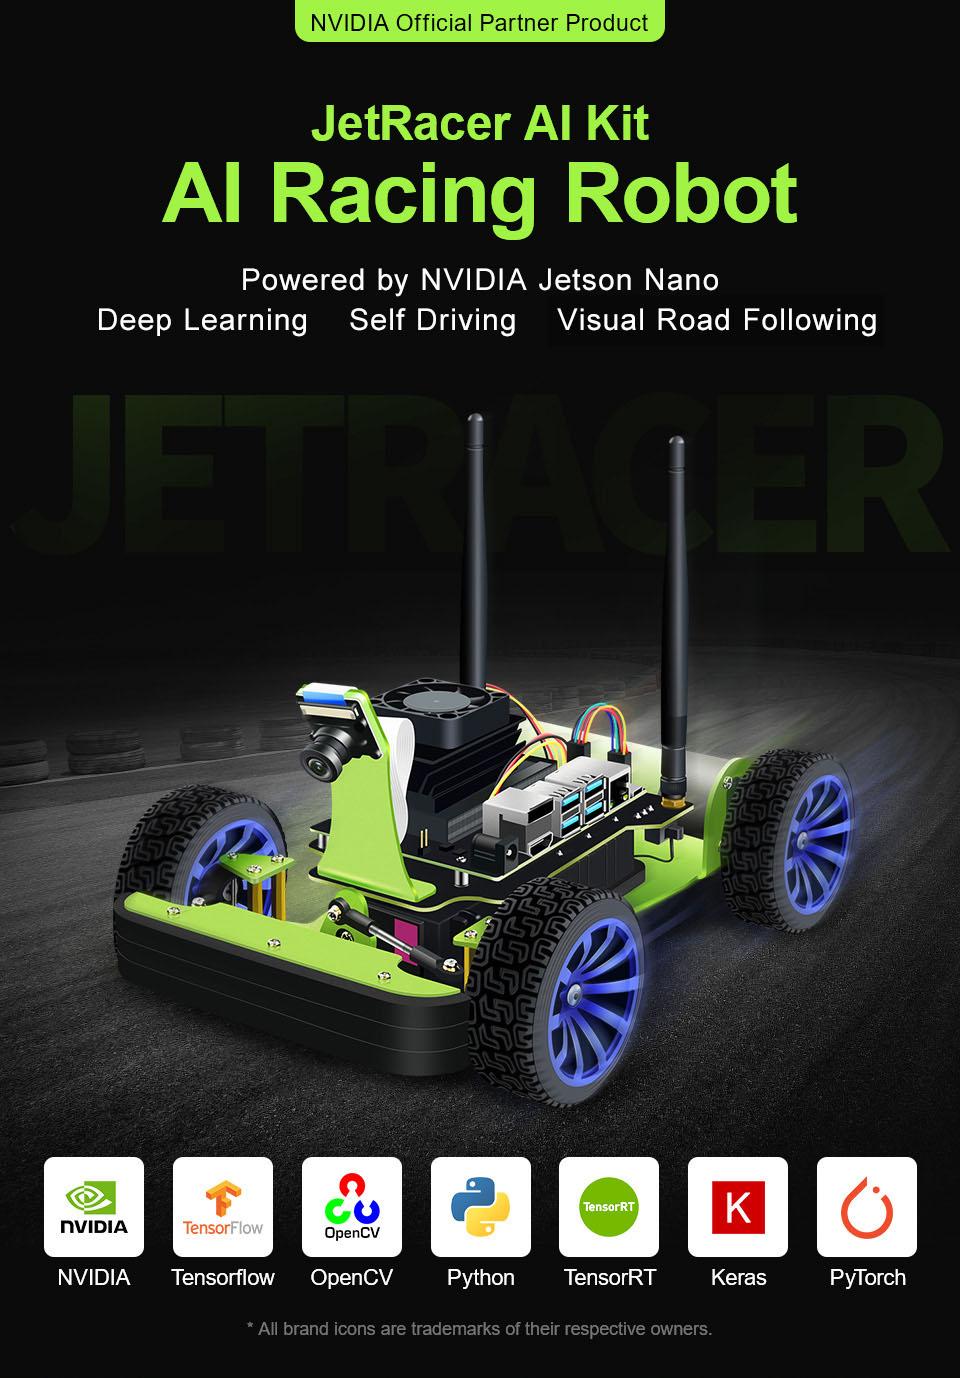 JetRacer-AI-Kit-Details_01.jpg